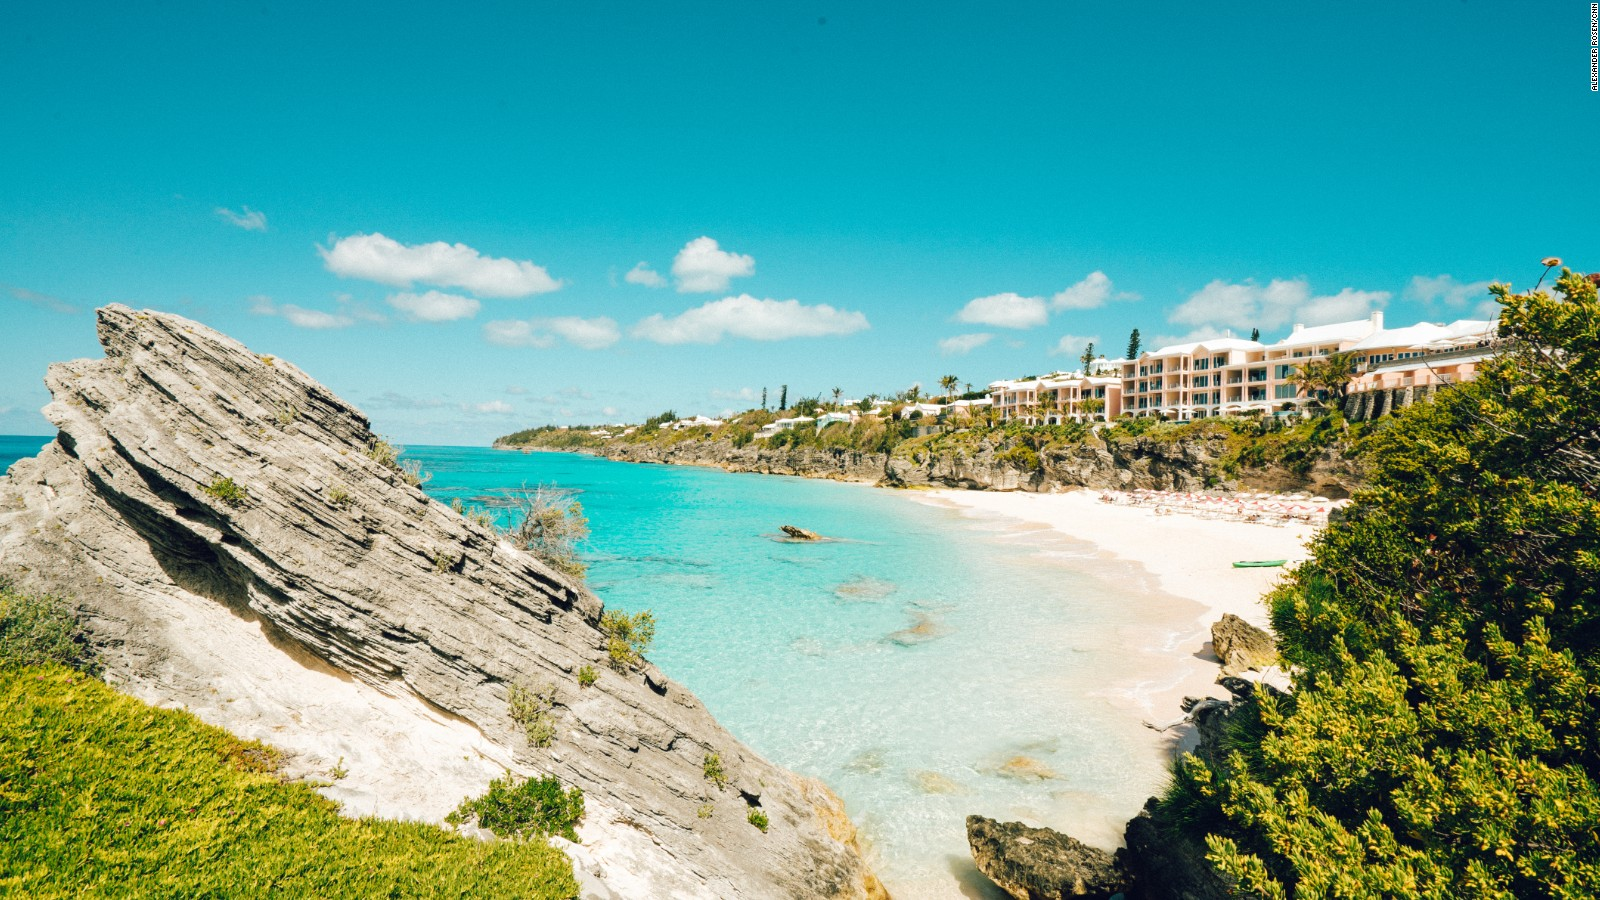 Travel EatStay GuideWhere Bermuda And PlayCnn To nPXwO0k8